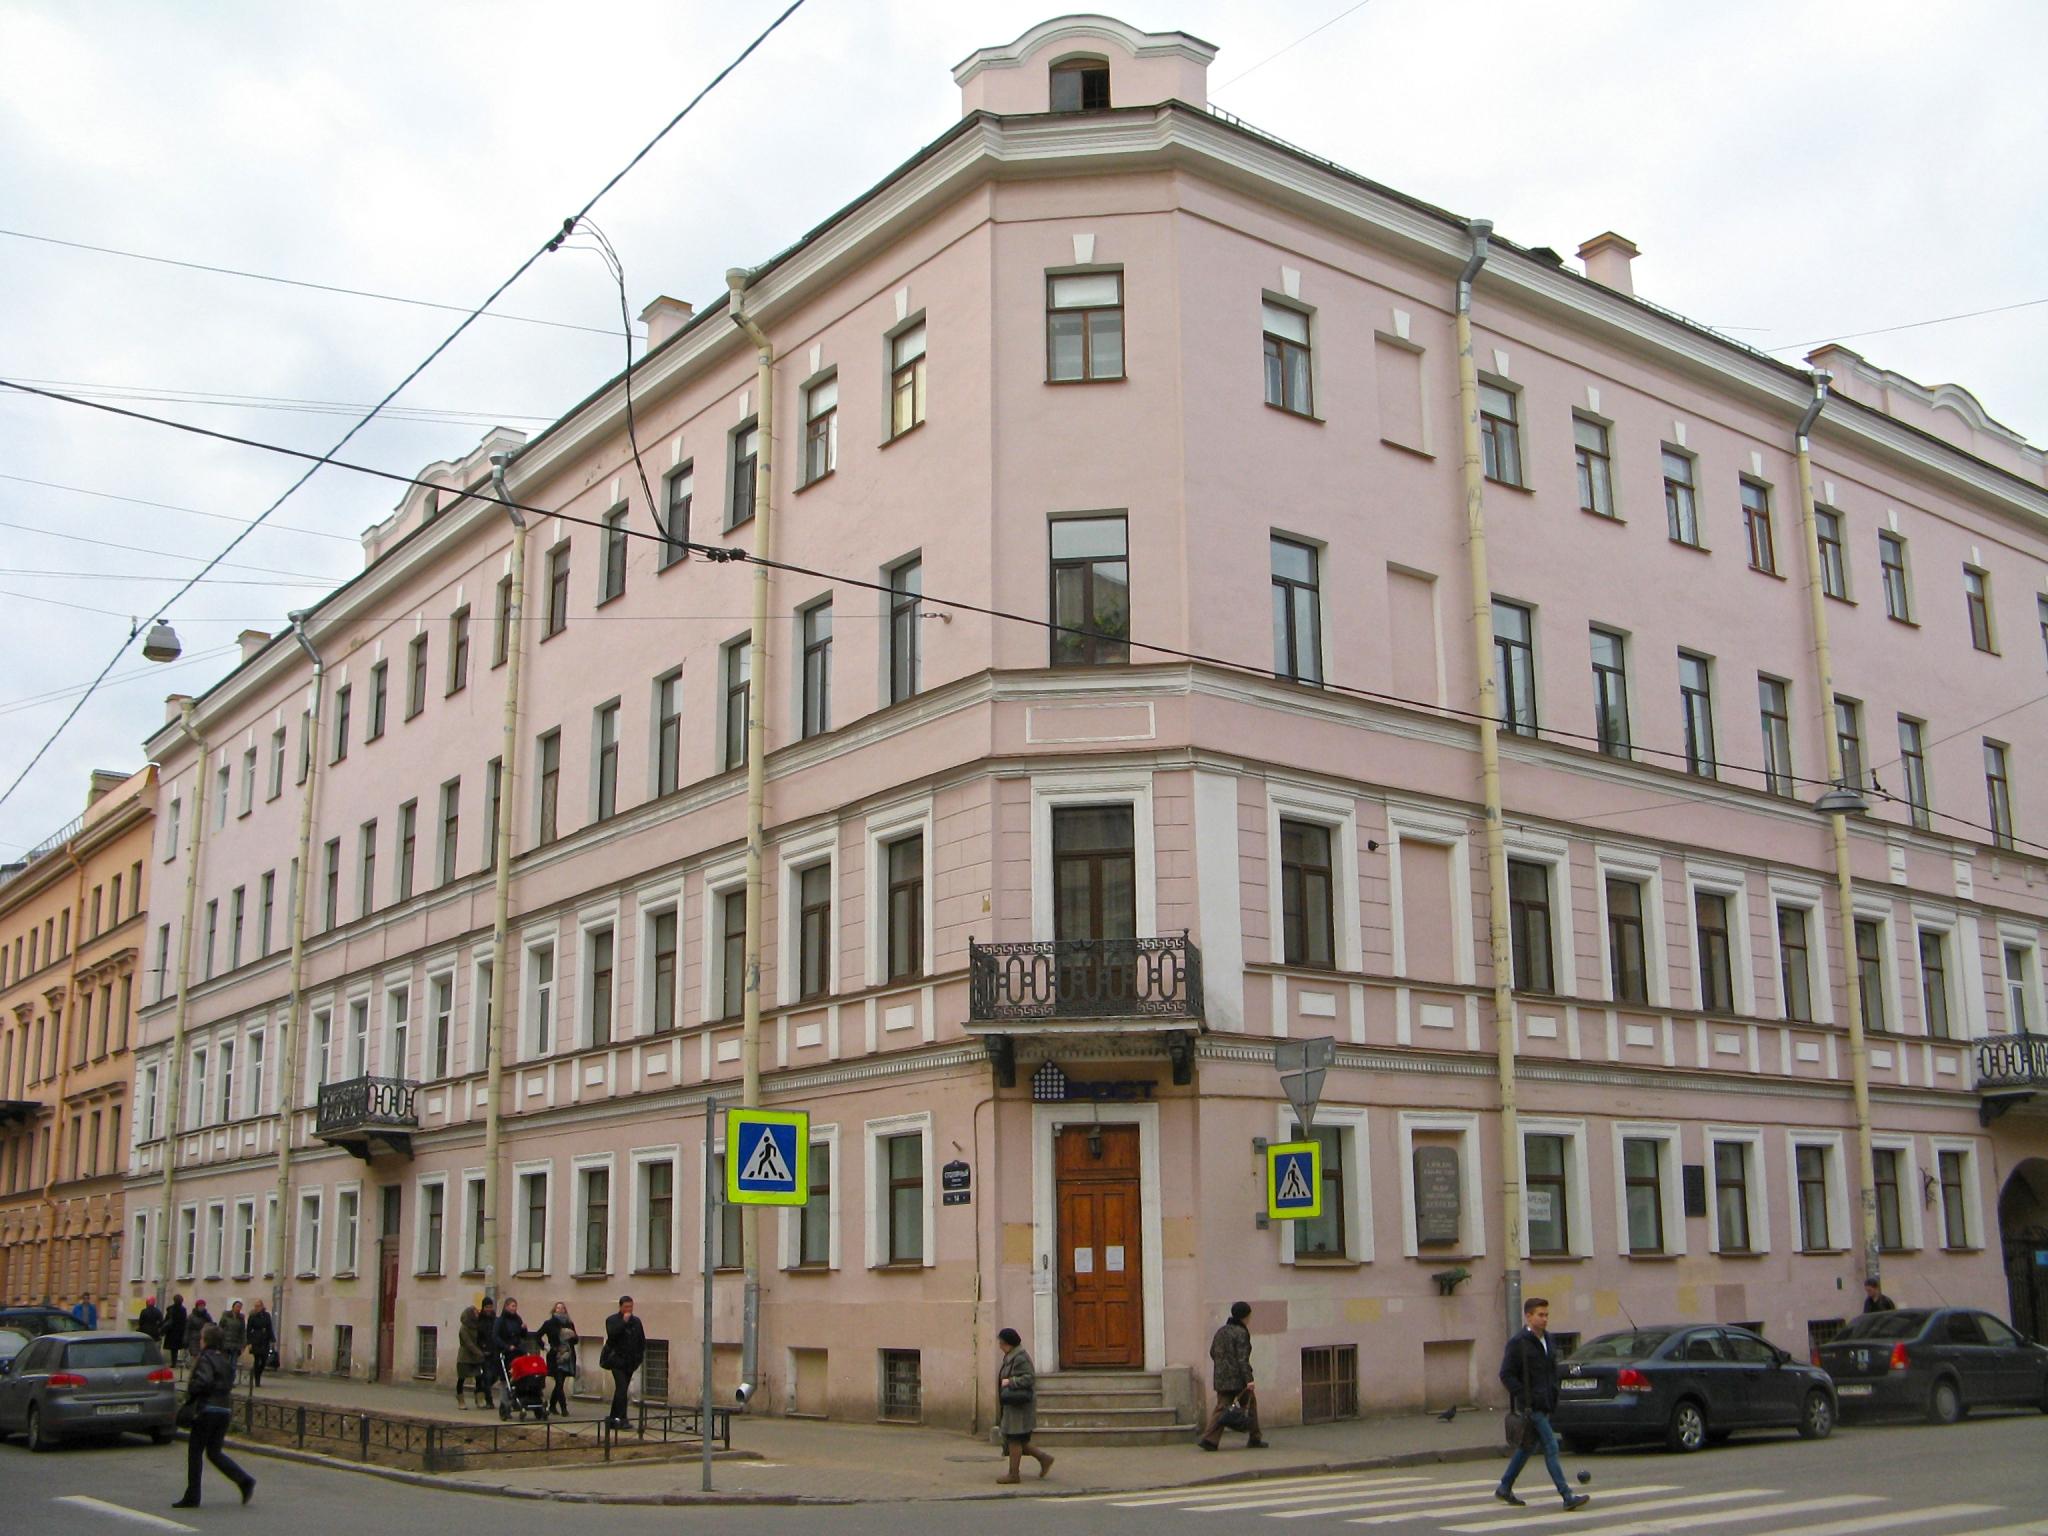 Petersbourg maison dostoievski crime châtiment raskolnikov